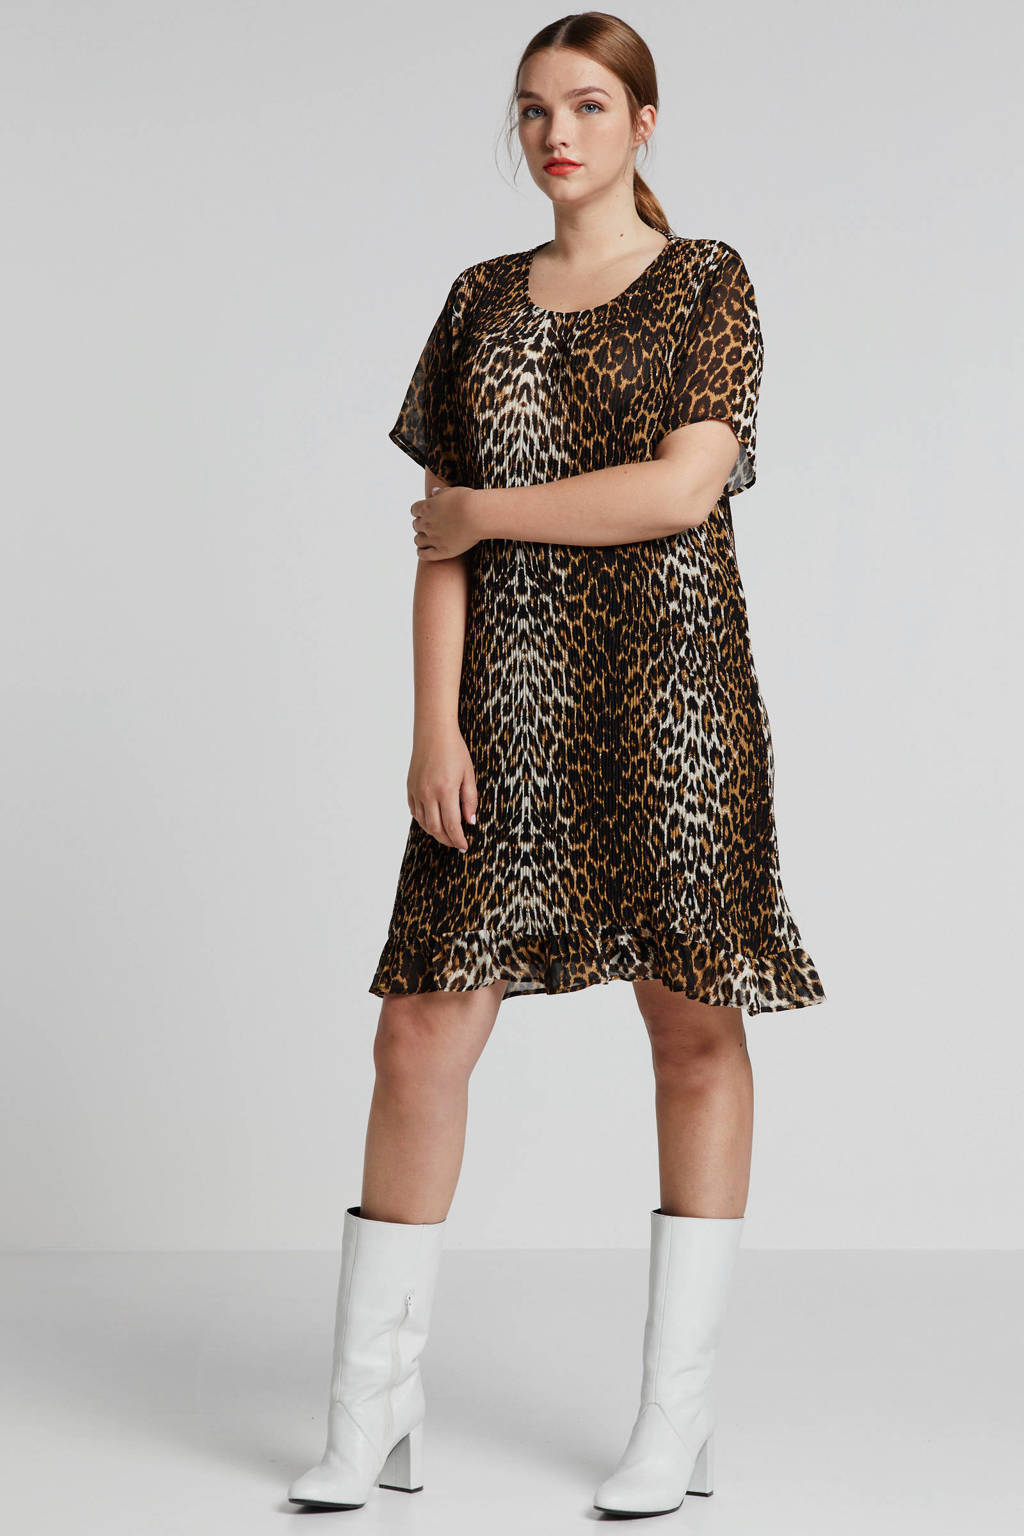 Zizzi jurk Pernille met panterprint, Bruin/zwart/beige